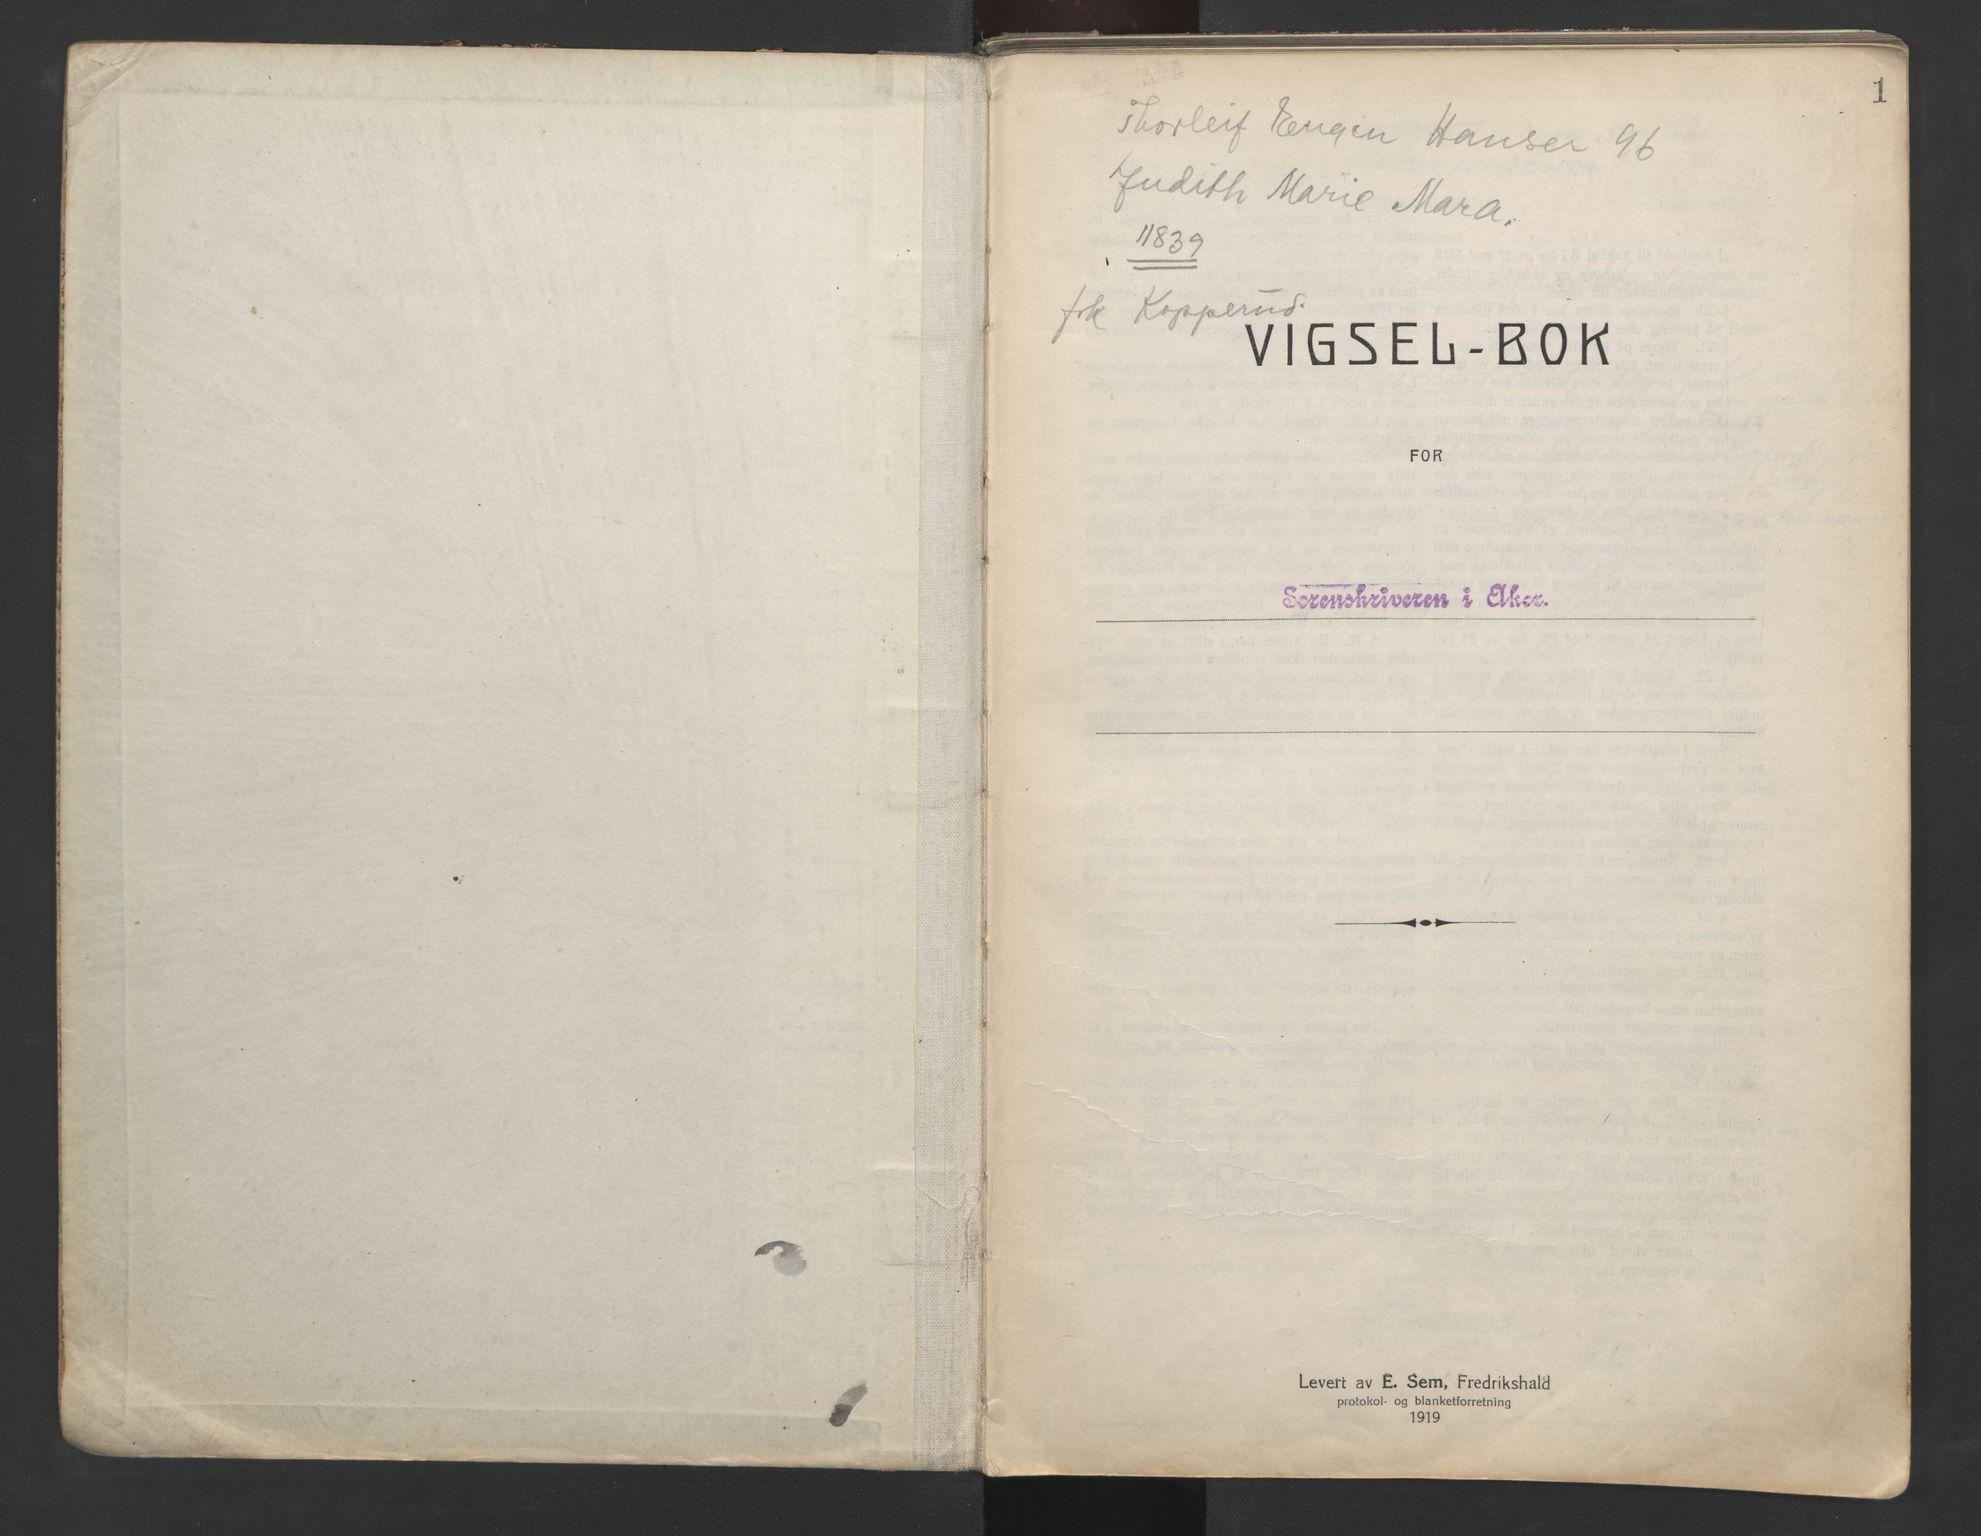 SAO, Aker sorenskriveri, L/Lc/Lcb/L0001: Vigselprotokoll, 1920-1922, s. 1